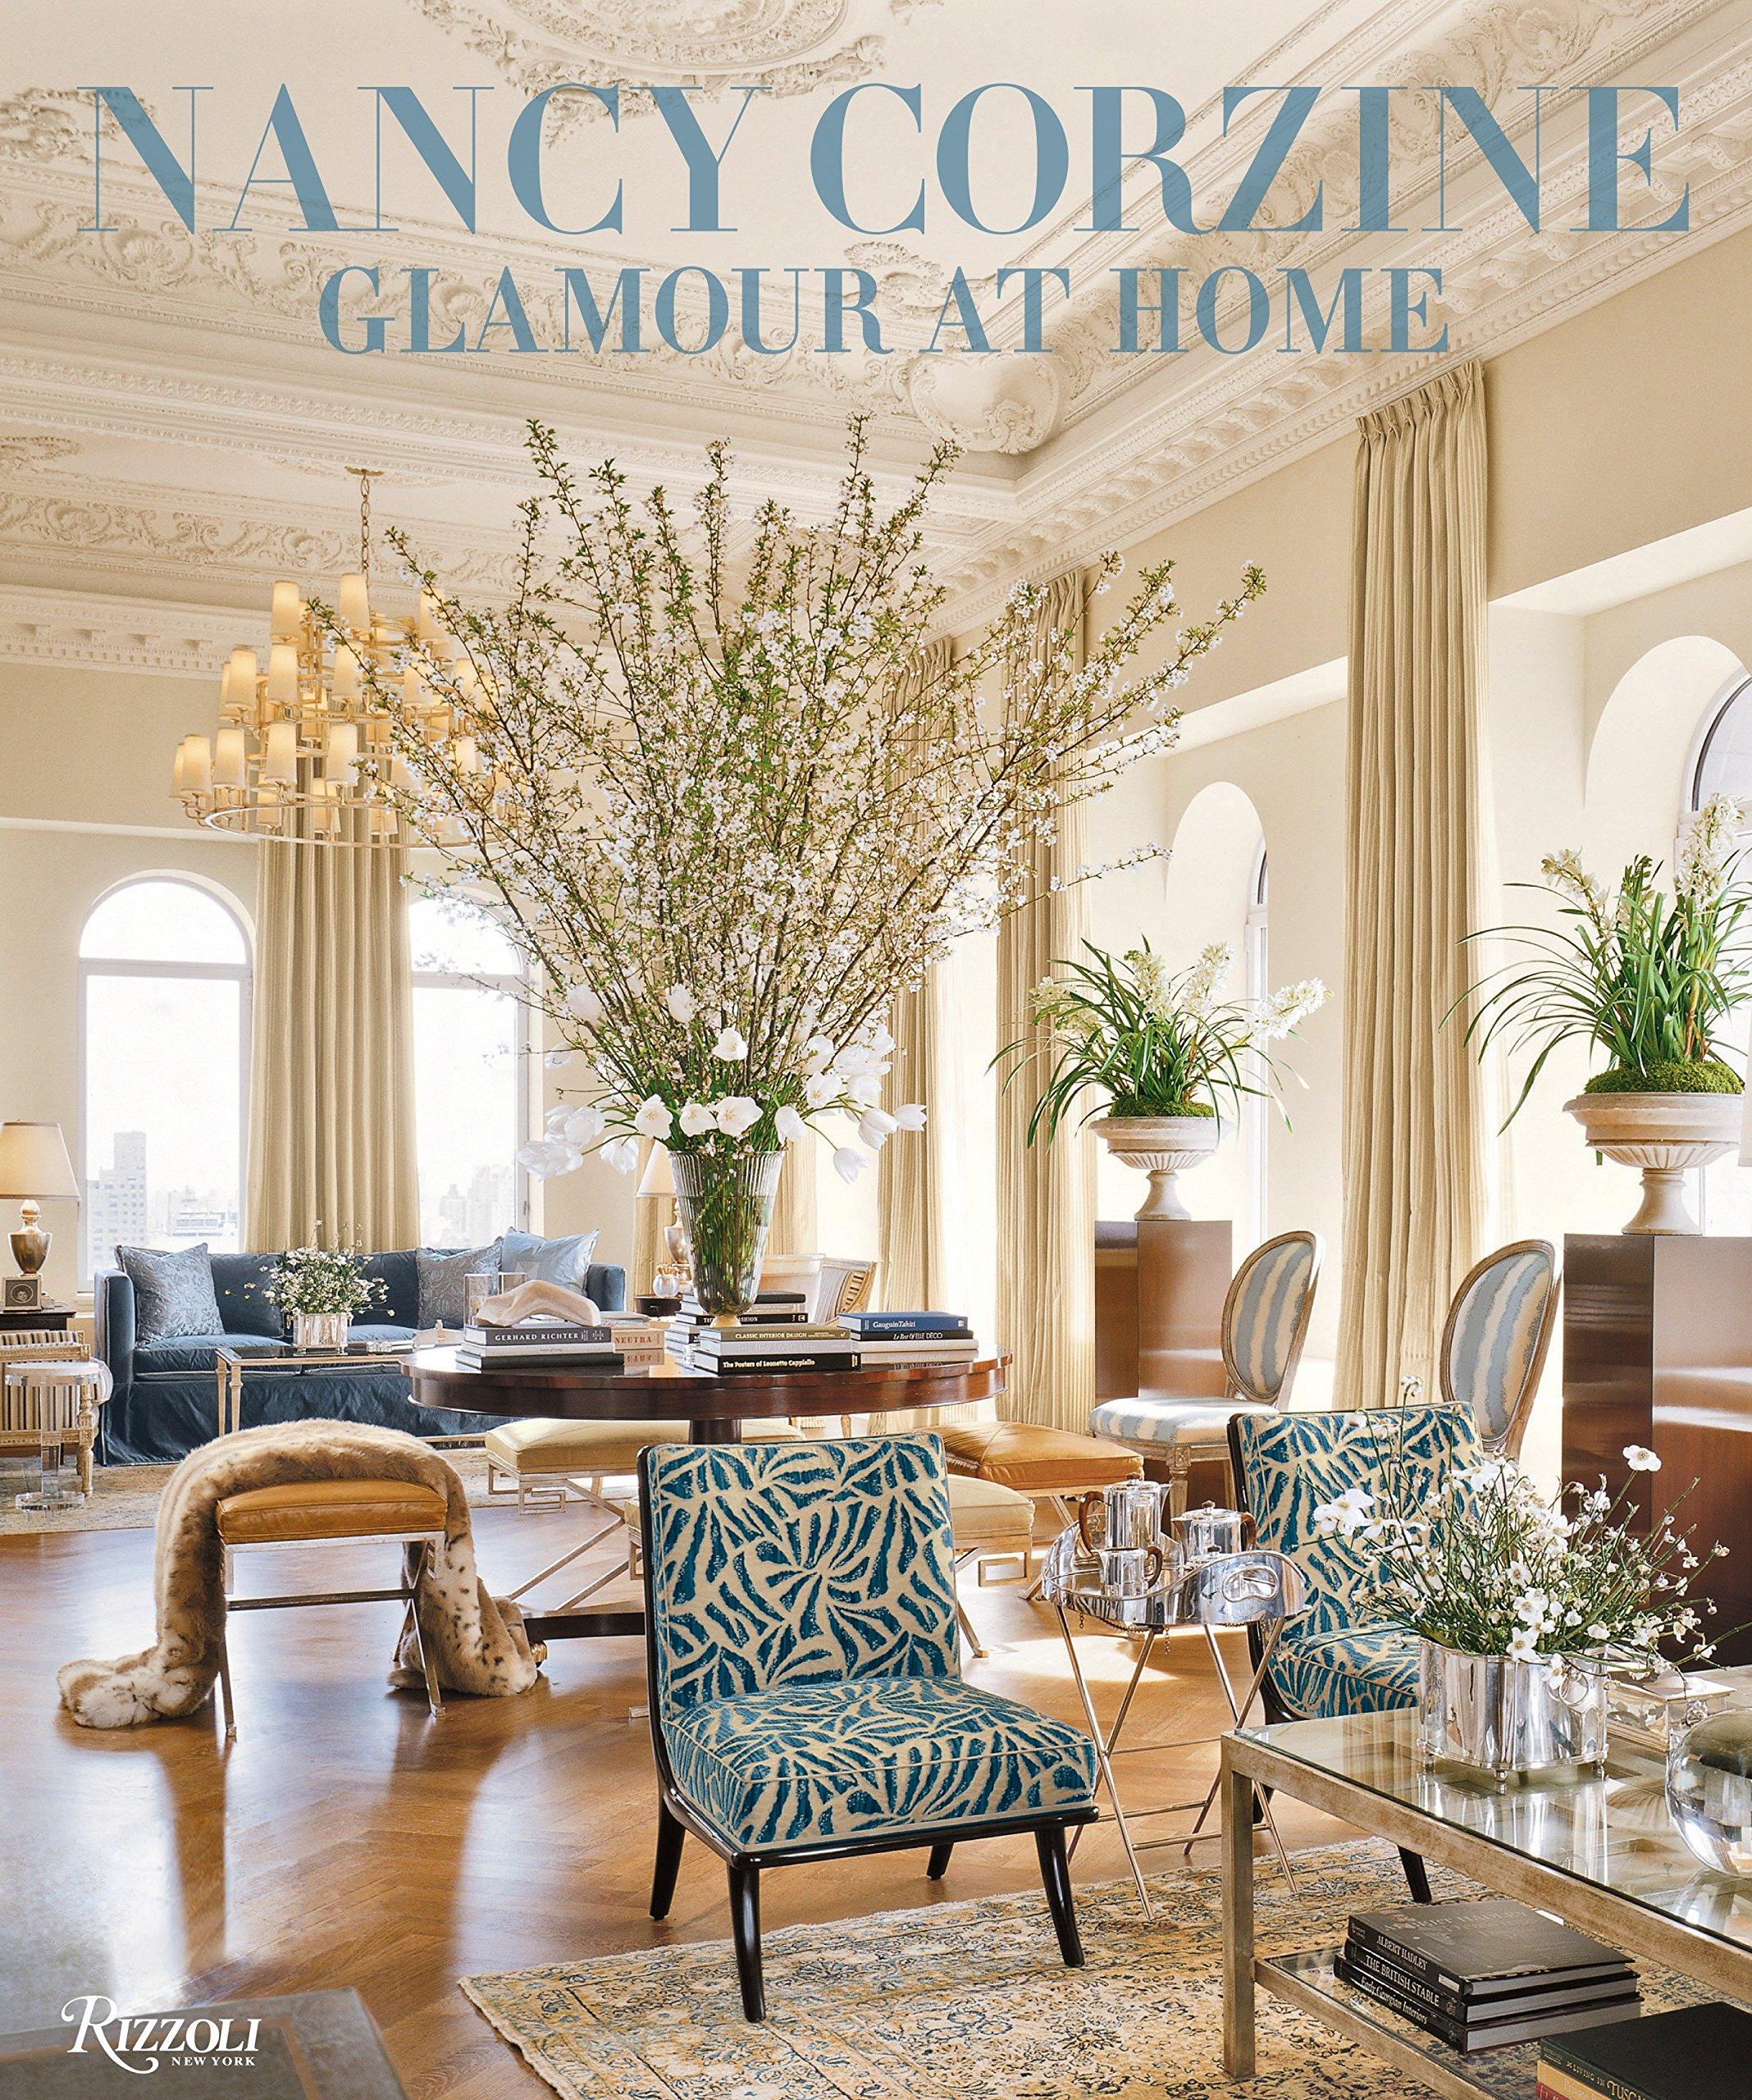 Nancy Corzine: Glamour at Home PDF